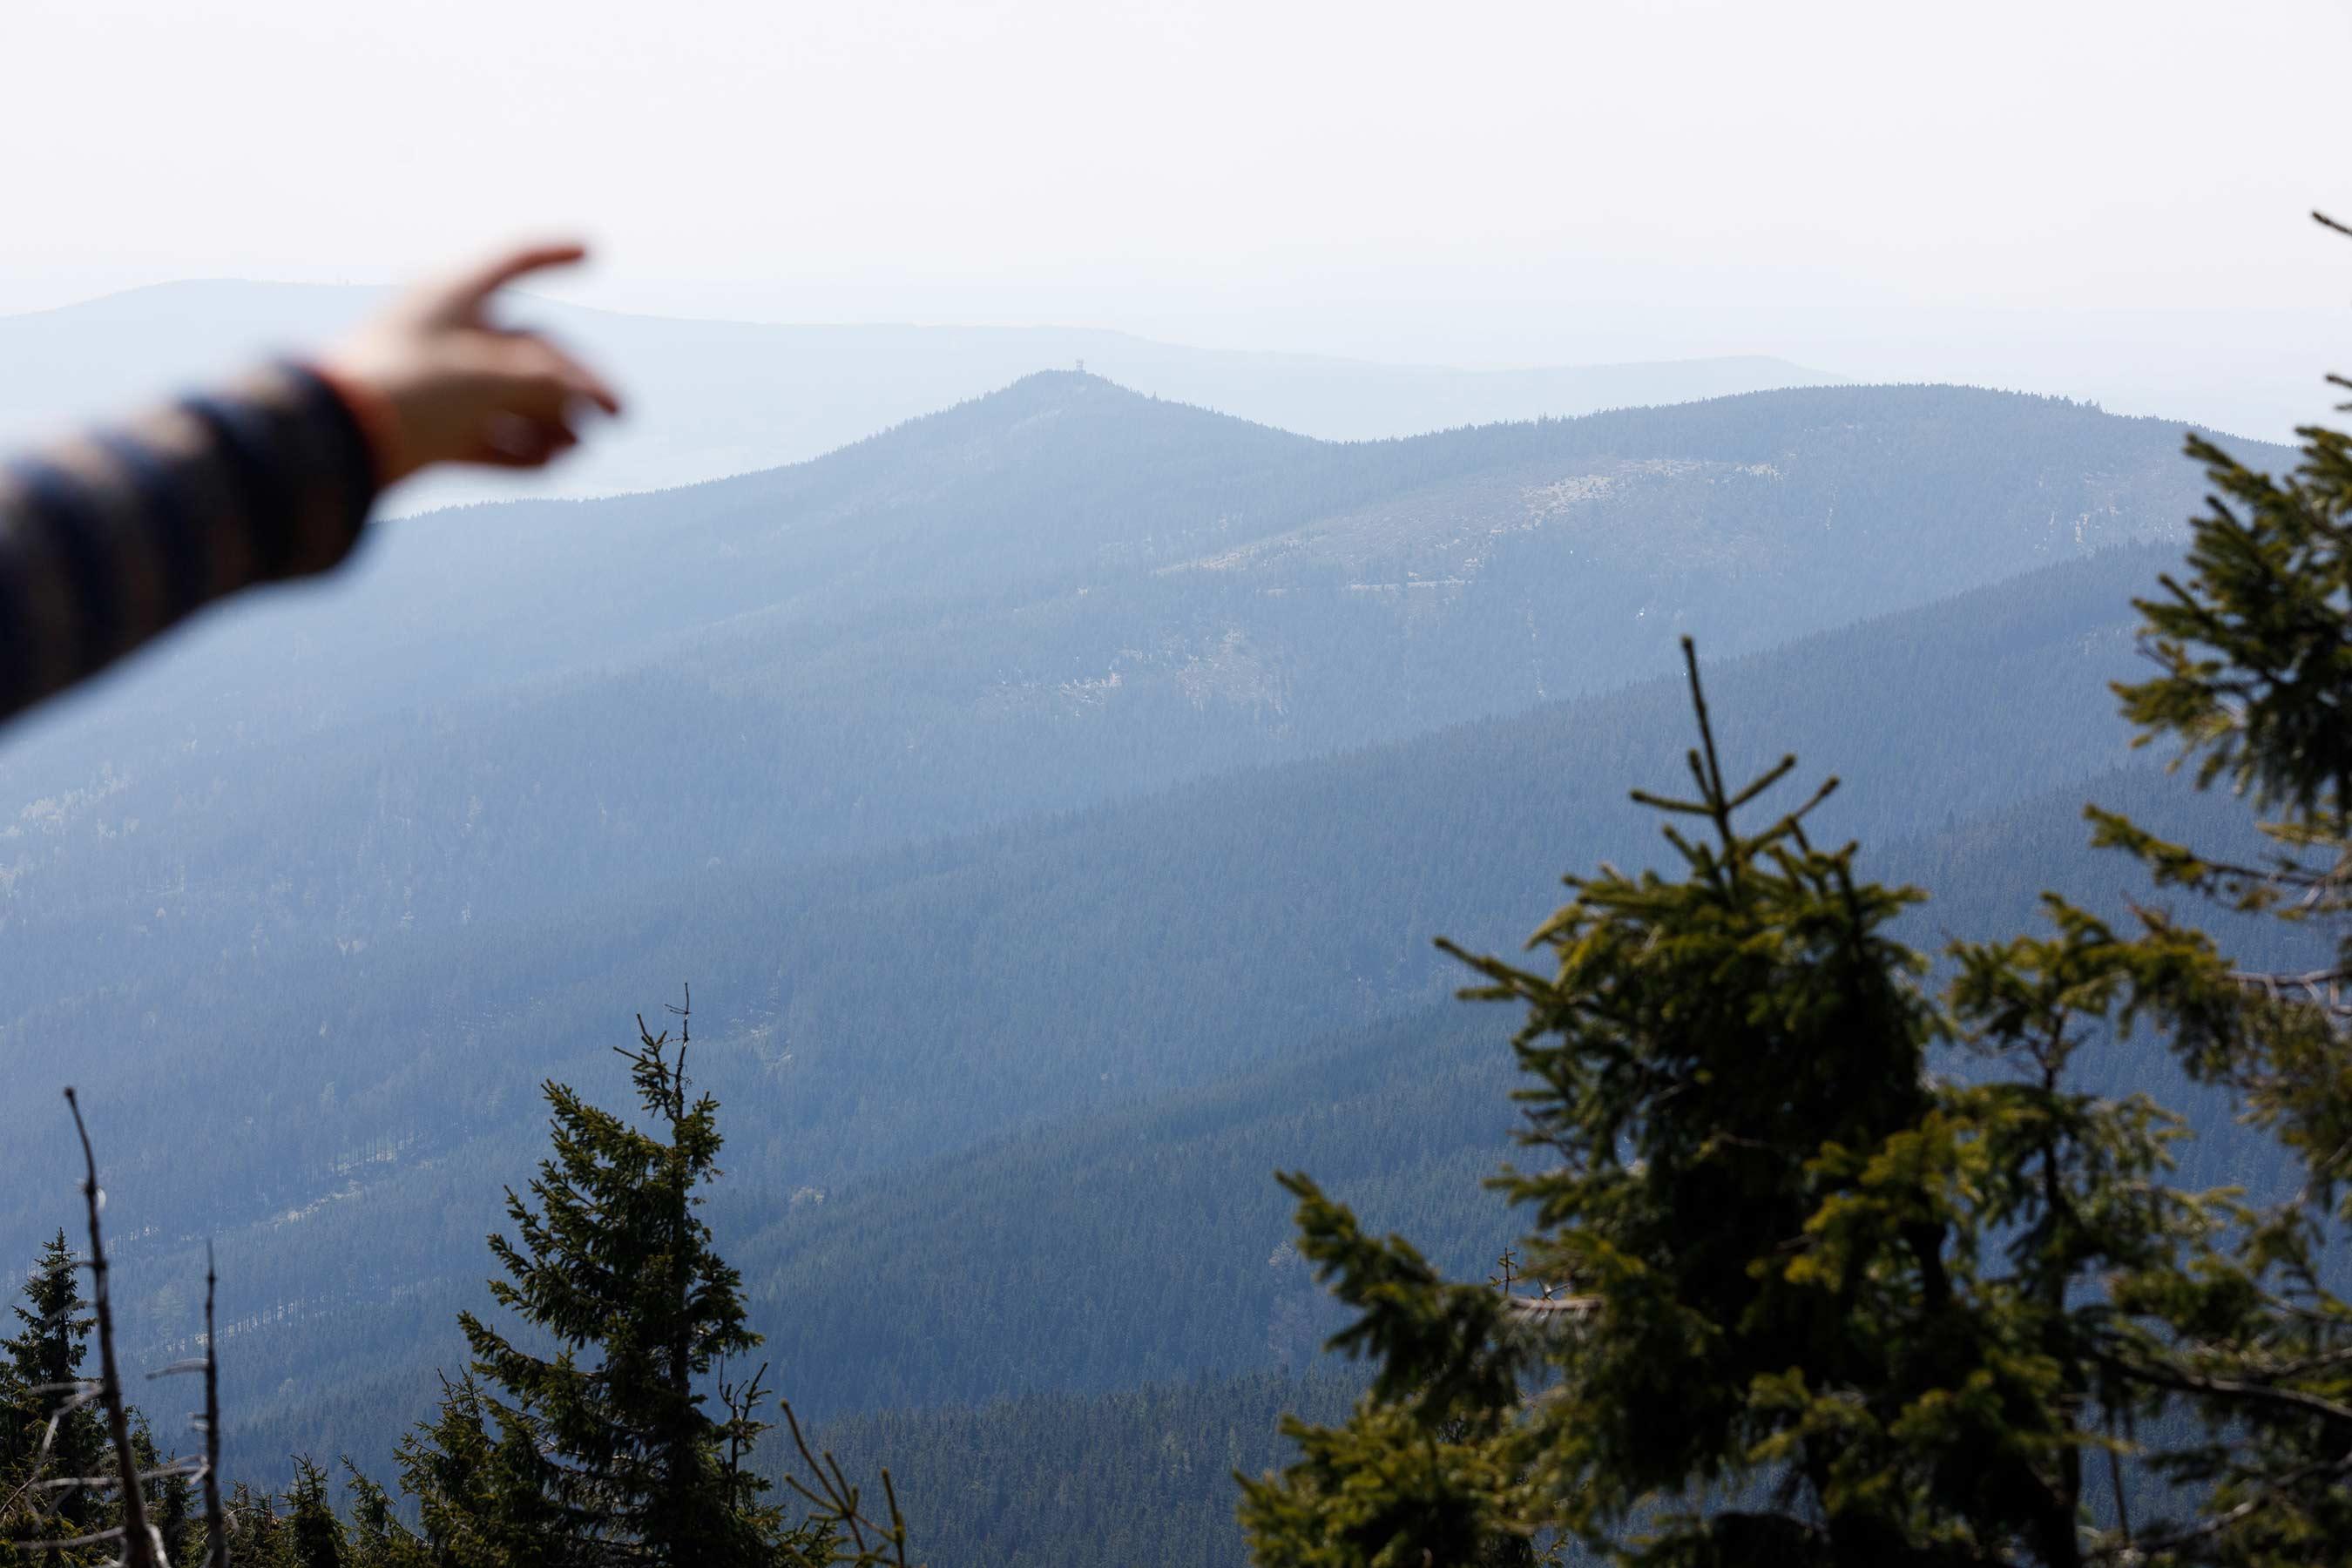 Klepac Mountain